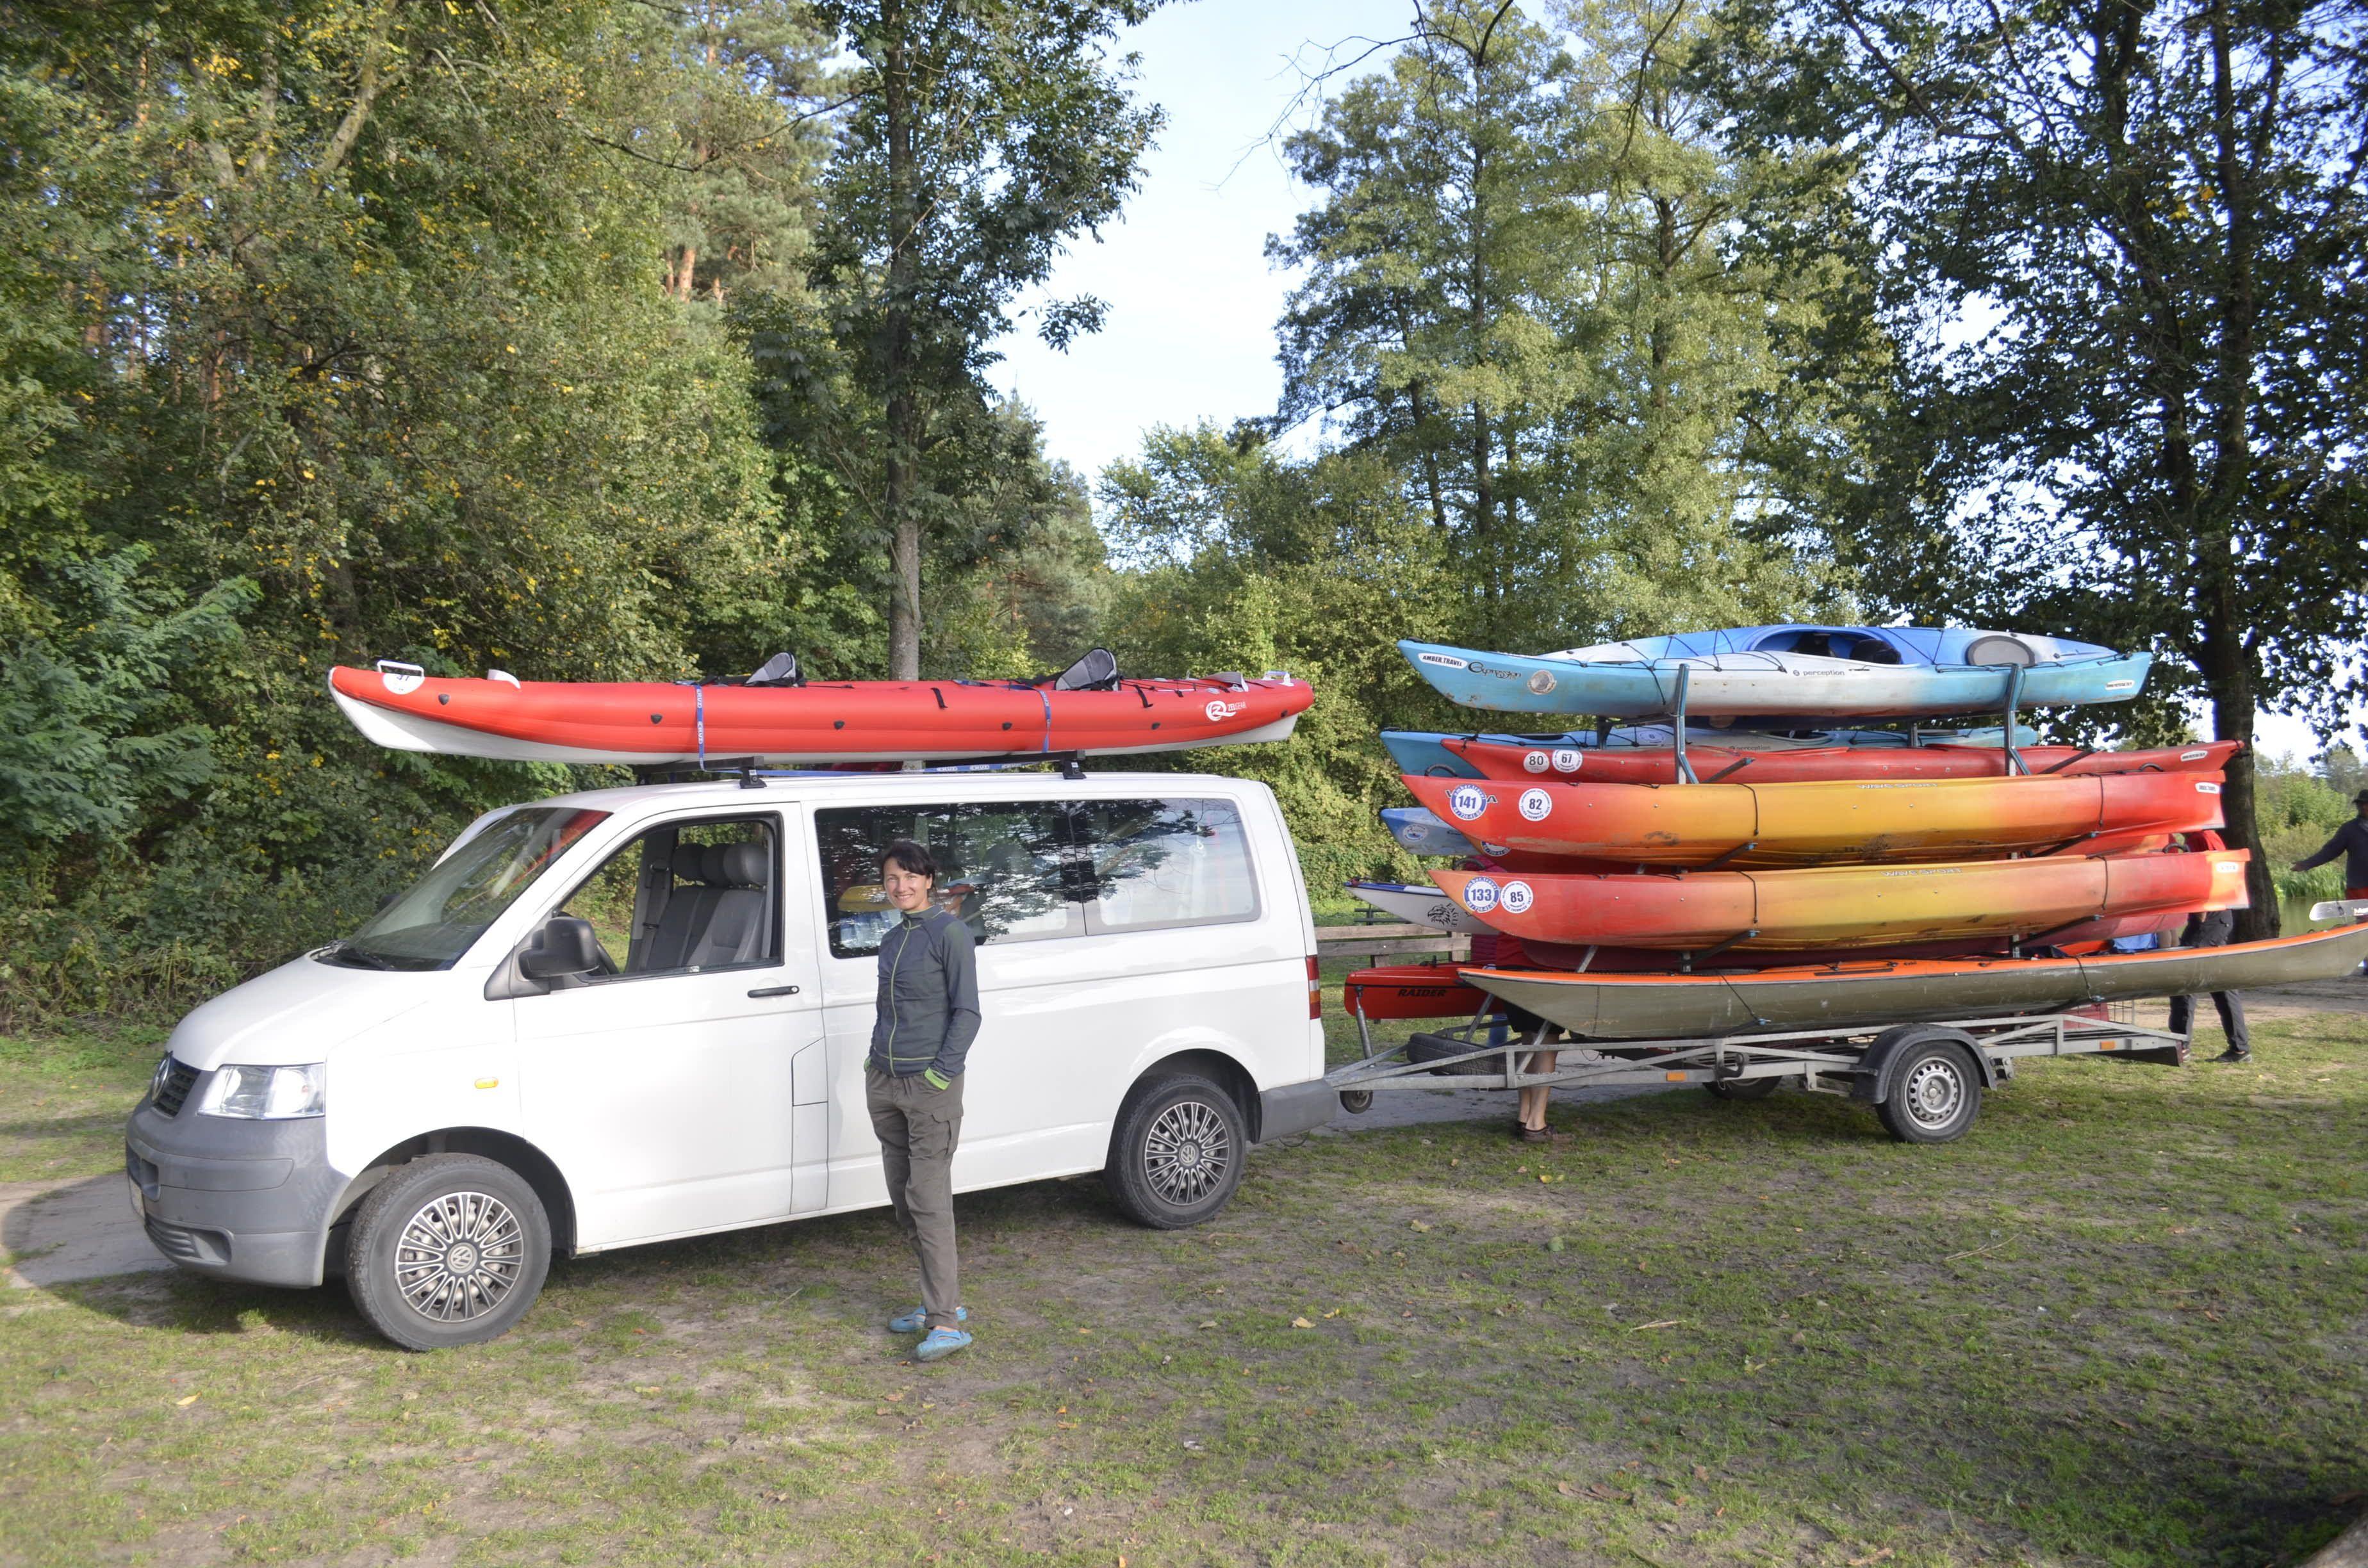 Ik Spark 450 Competitions In Poland Kayaking Inflatable Kayak Van